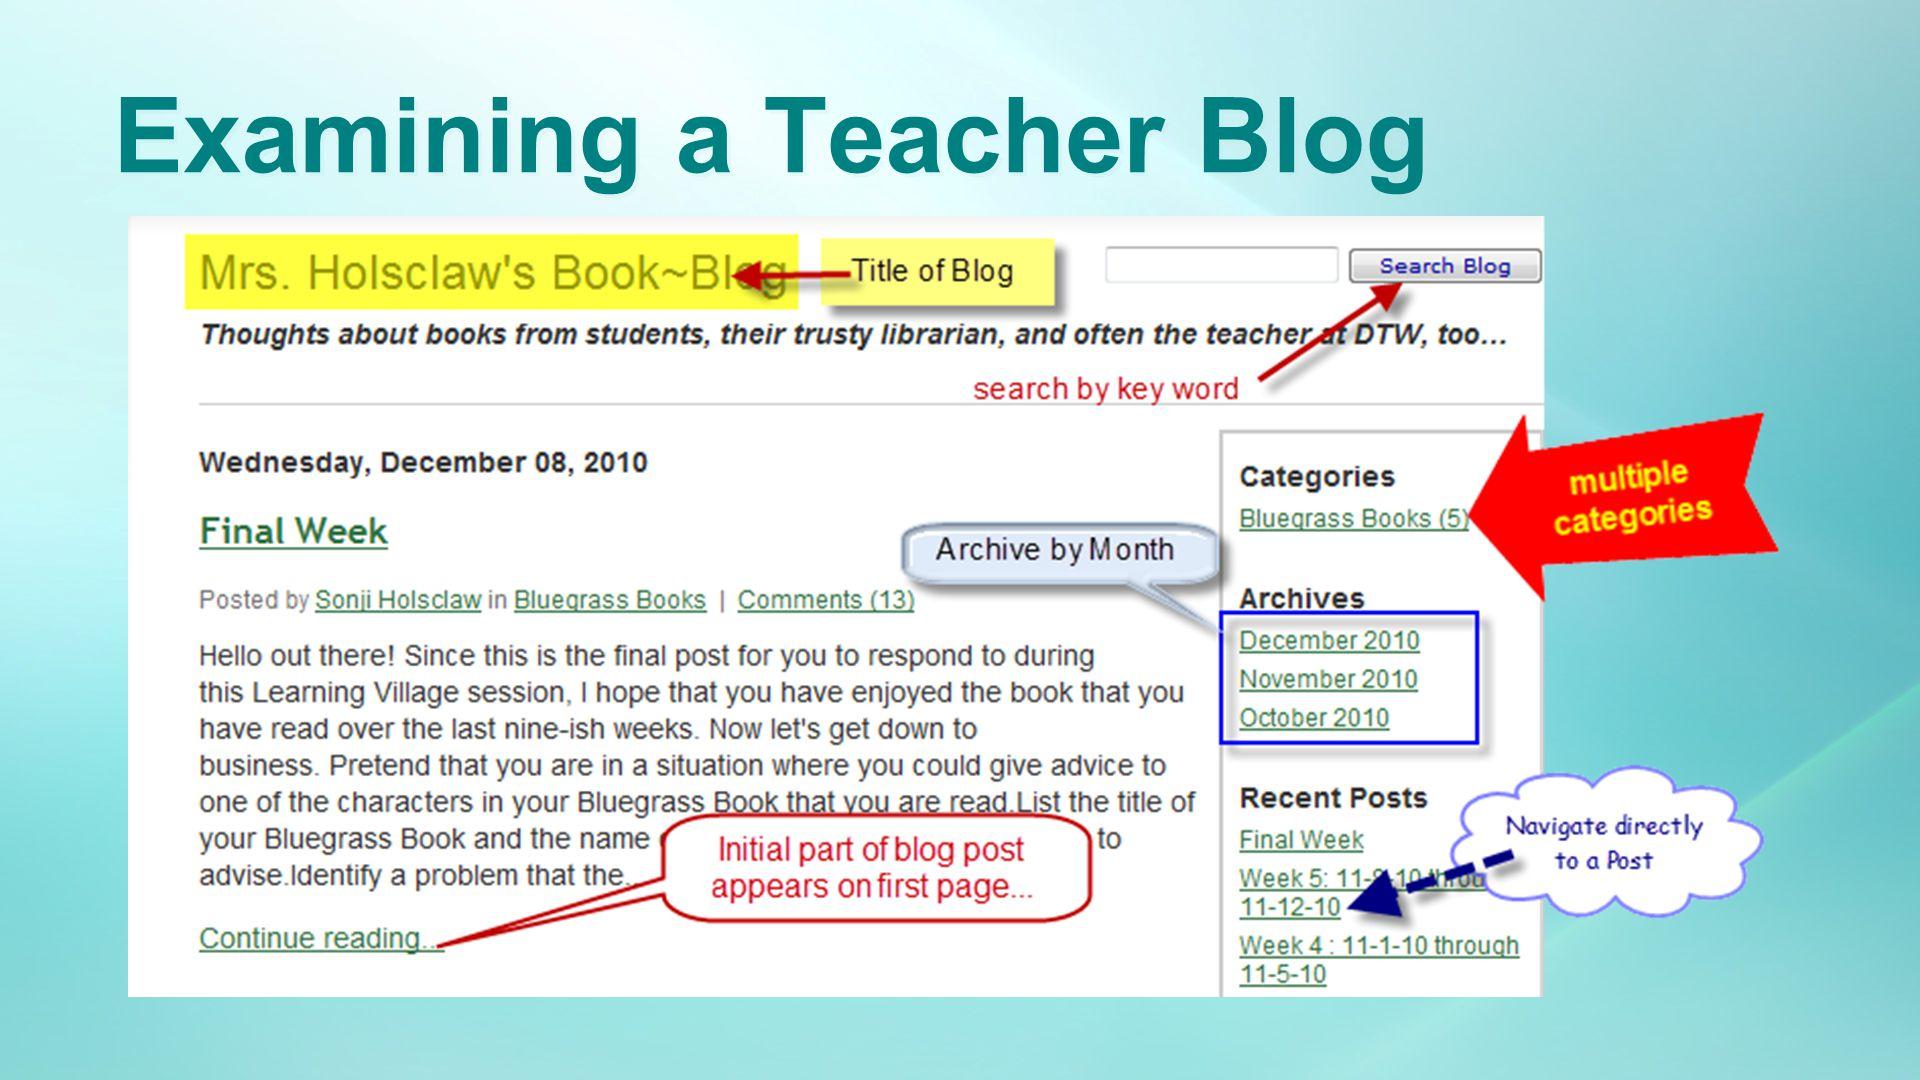 Examining a Teacher Blog